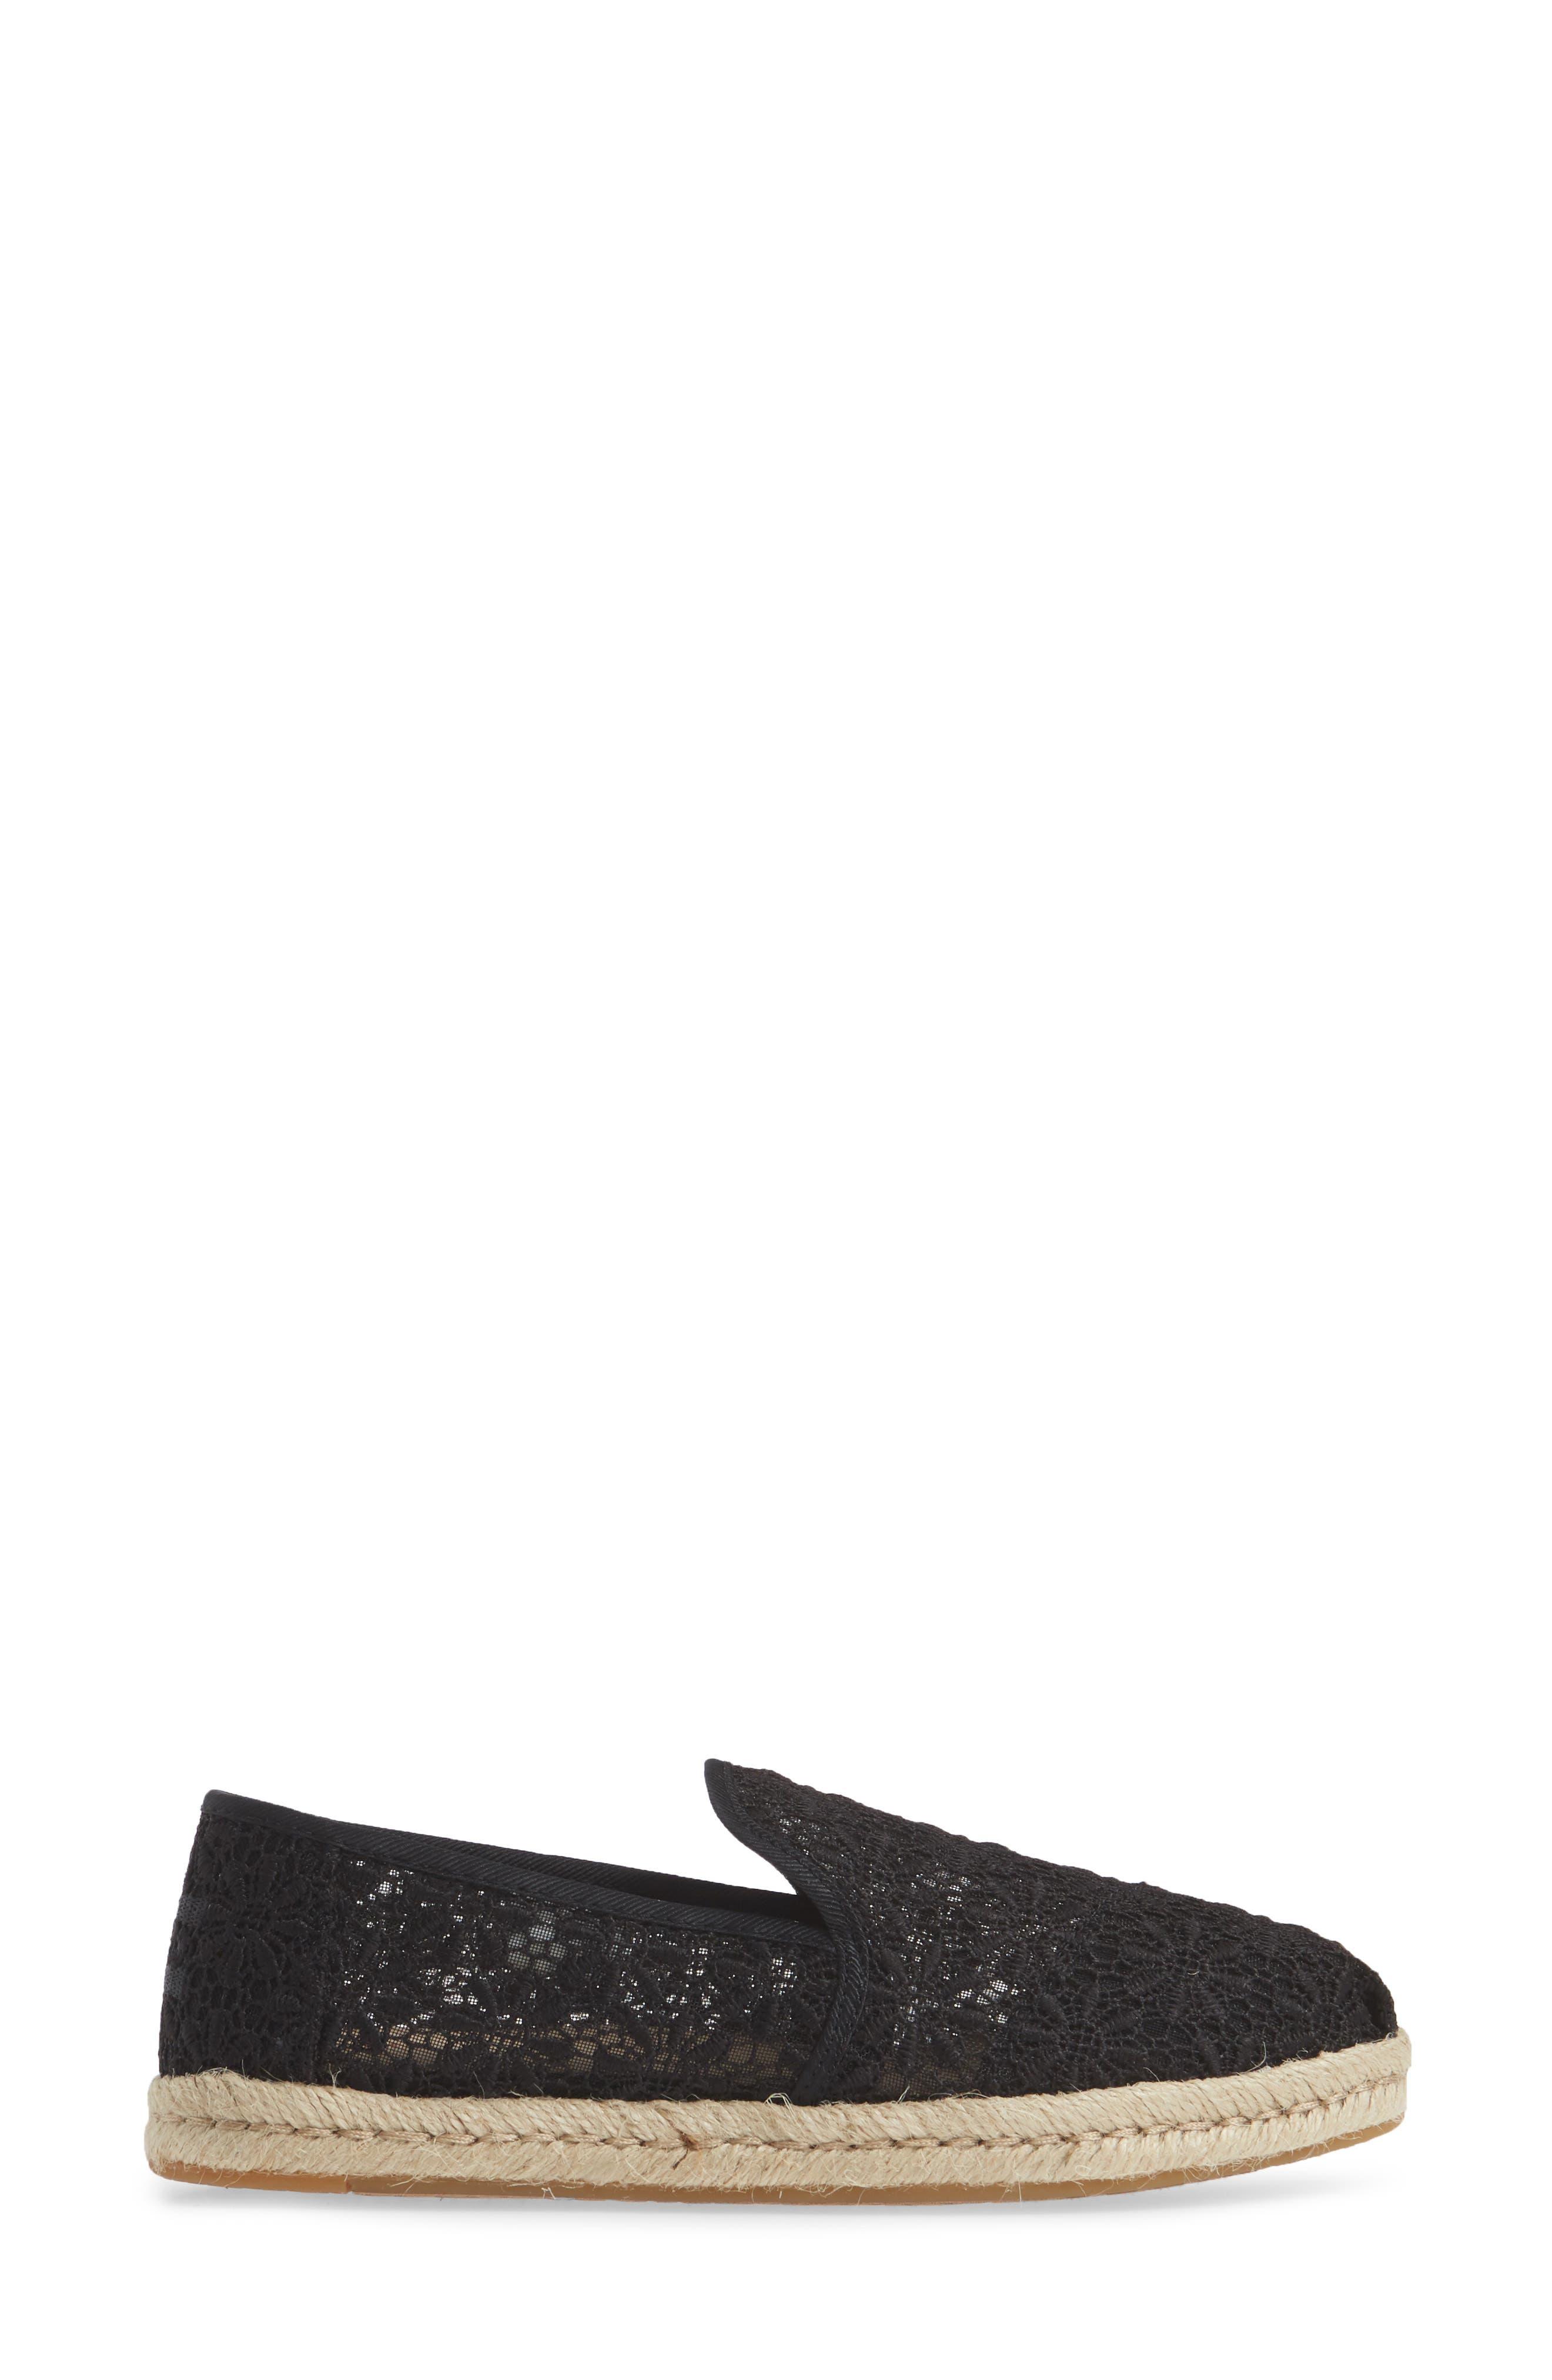 TOMS, Deconstructed Alpargata Slip-On, Alternate thumbnail 3, color, BLACK FLORAL LACE FABRIC